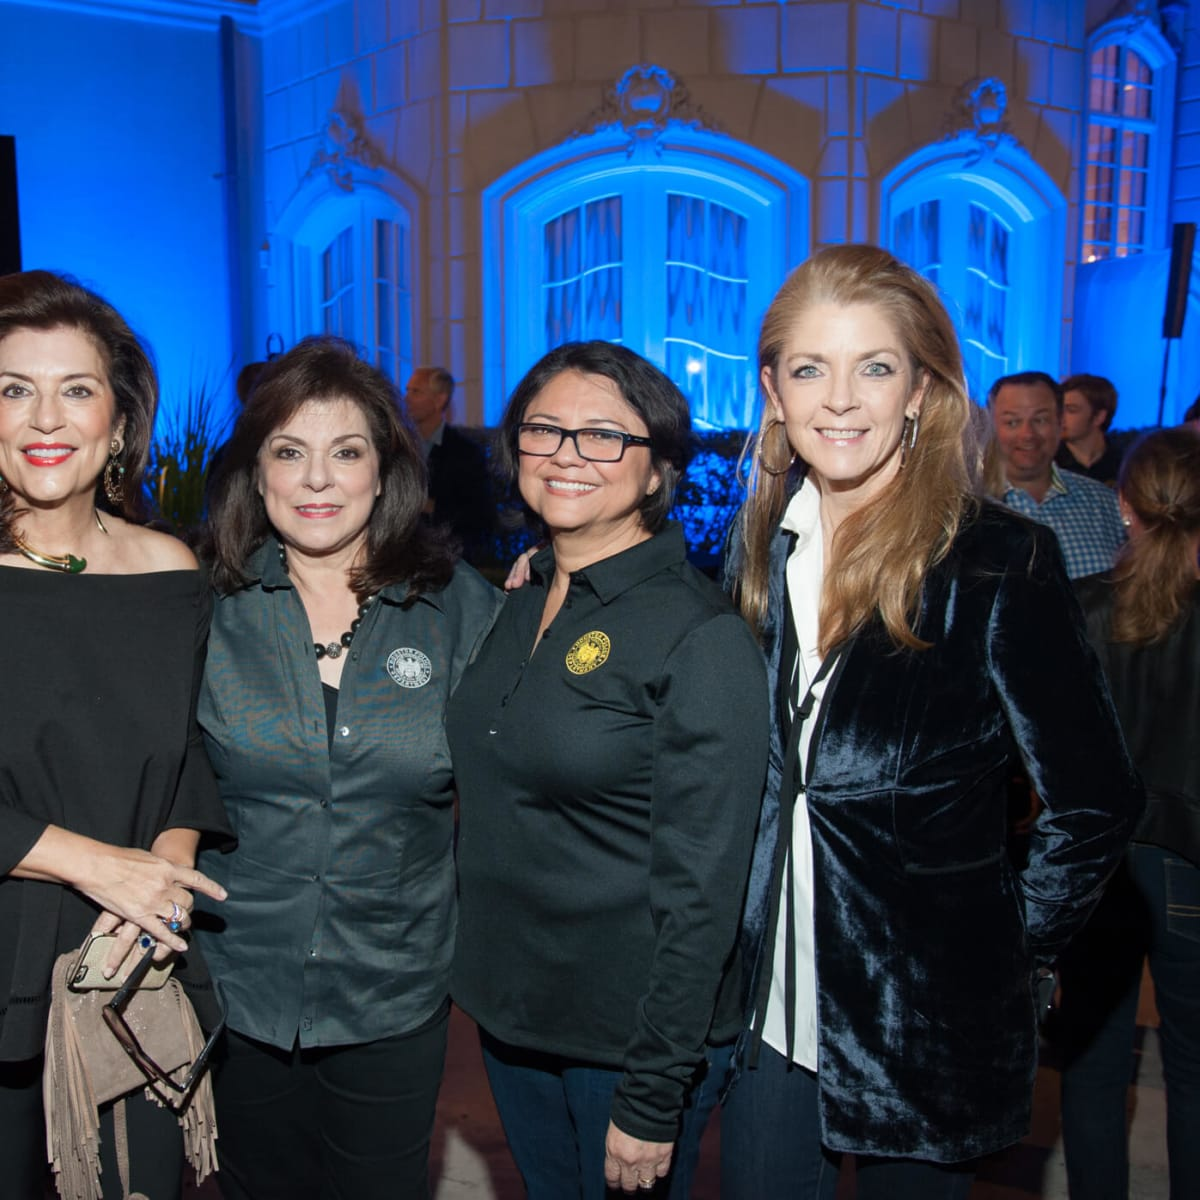 Houston, HPD True Blue Gala, Oct. 2016, Dancie Ware, Laura Ward, interim Houston Police chief Martha I. Montalvo, Paige Fertitta